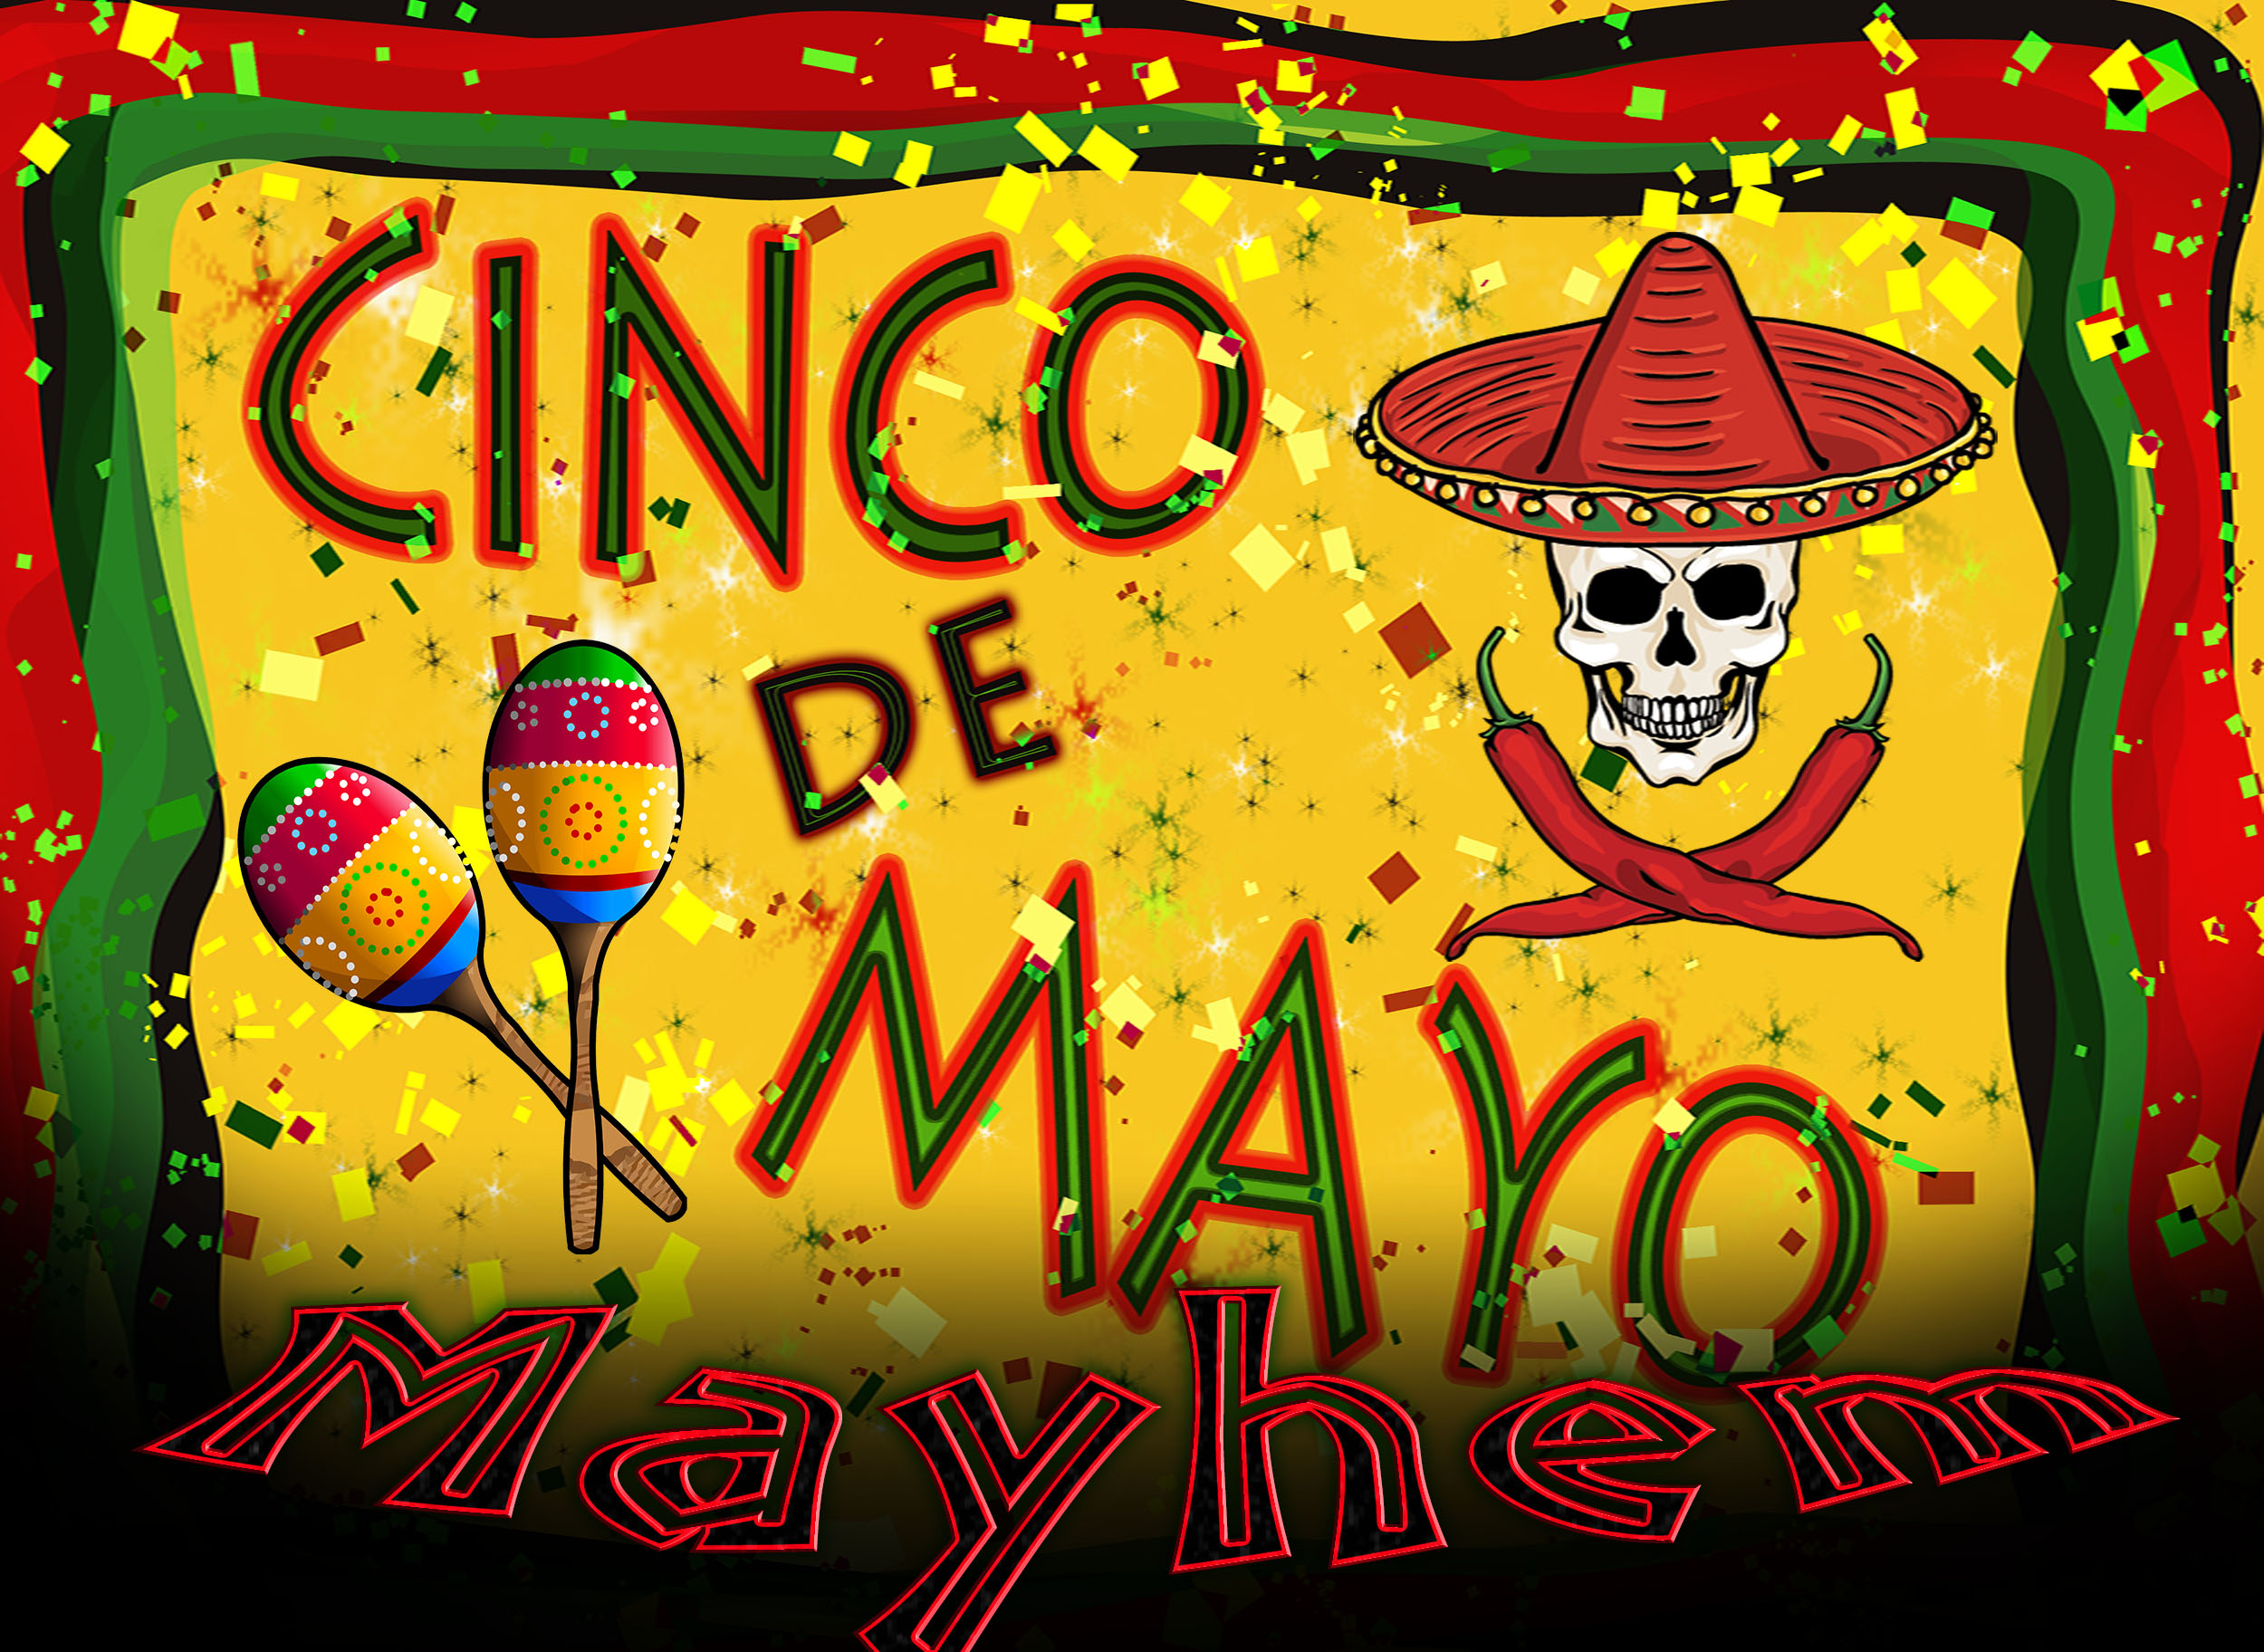 Cinco de Mayo Mayhem by My Mystery Party